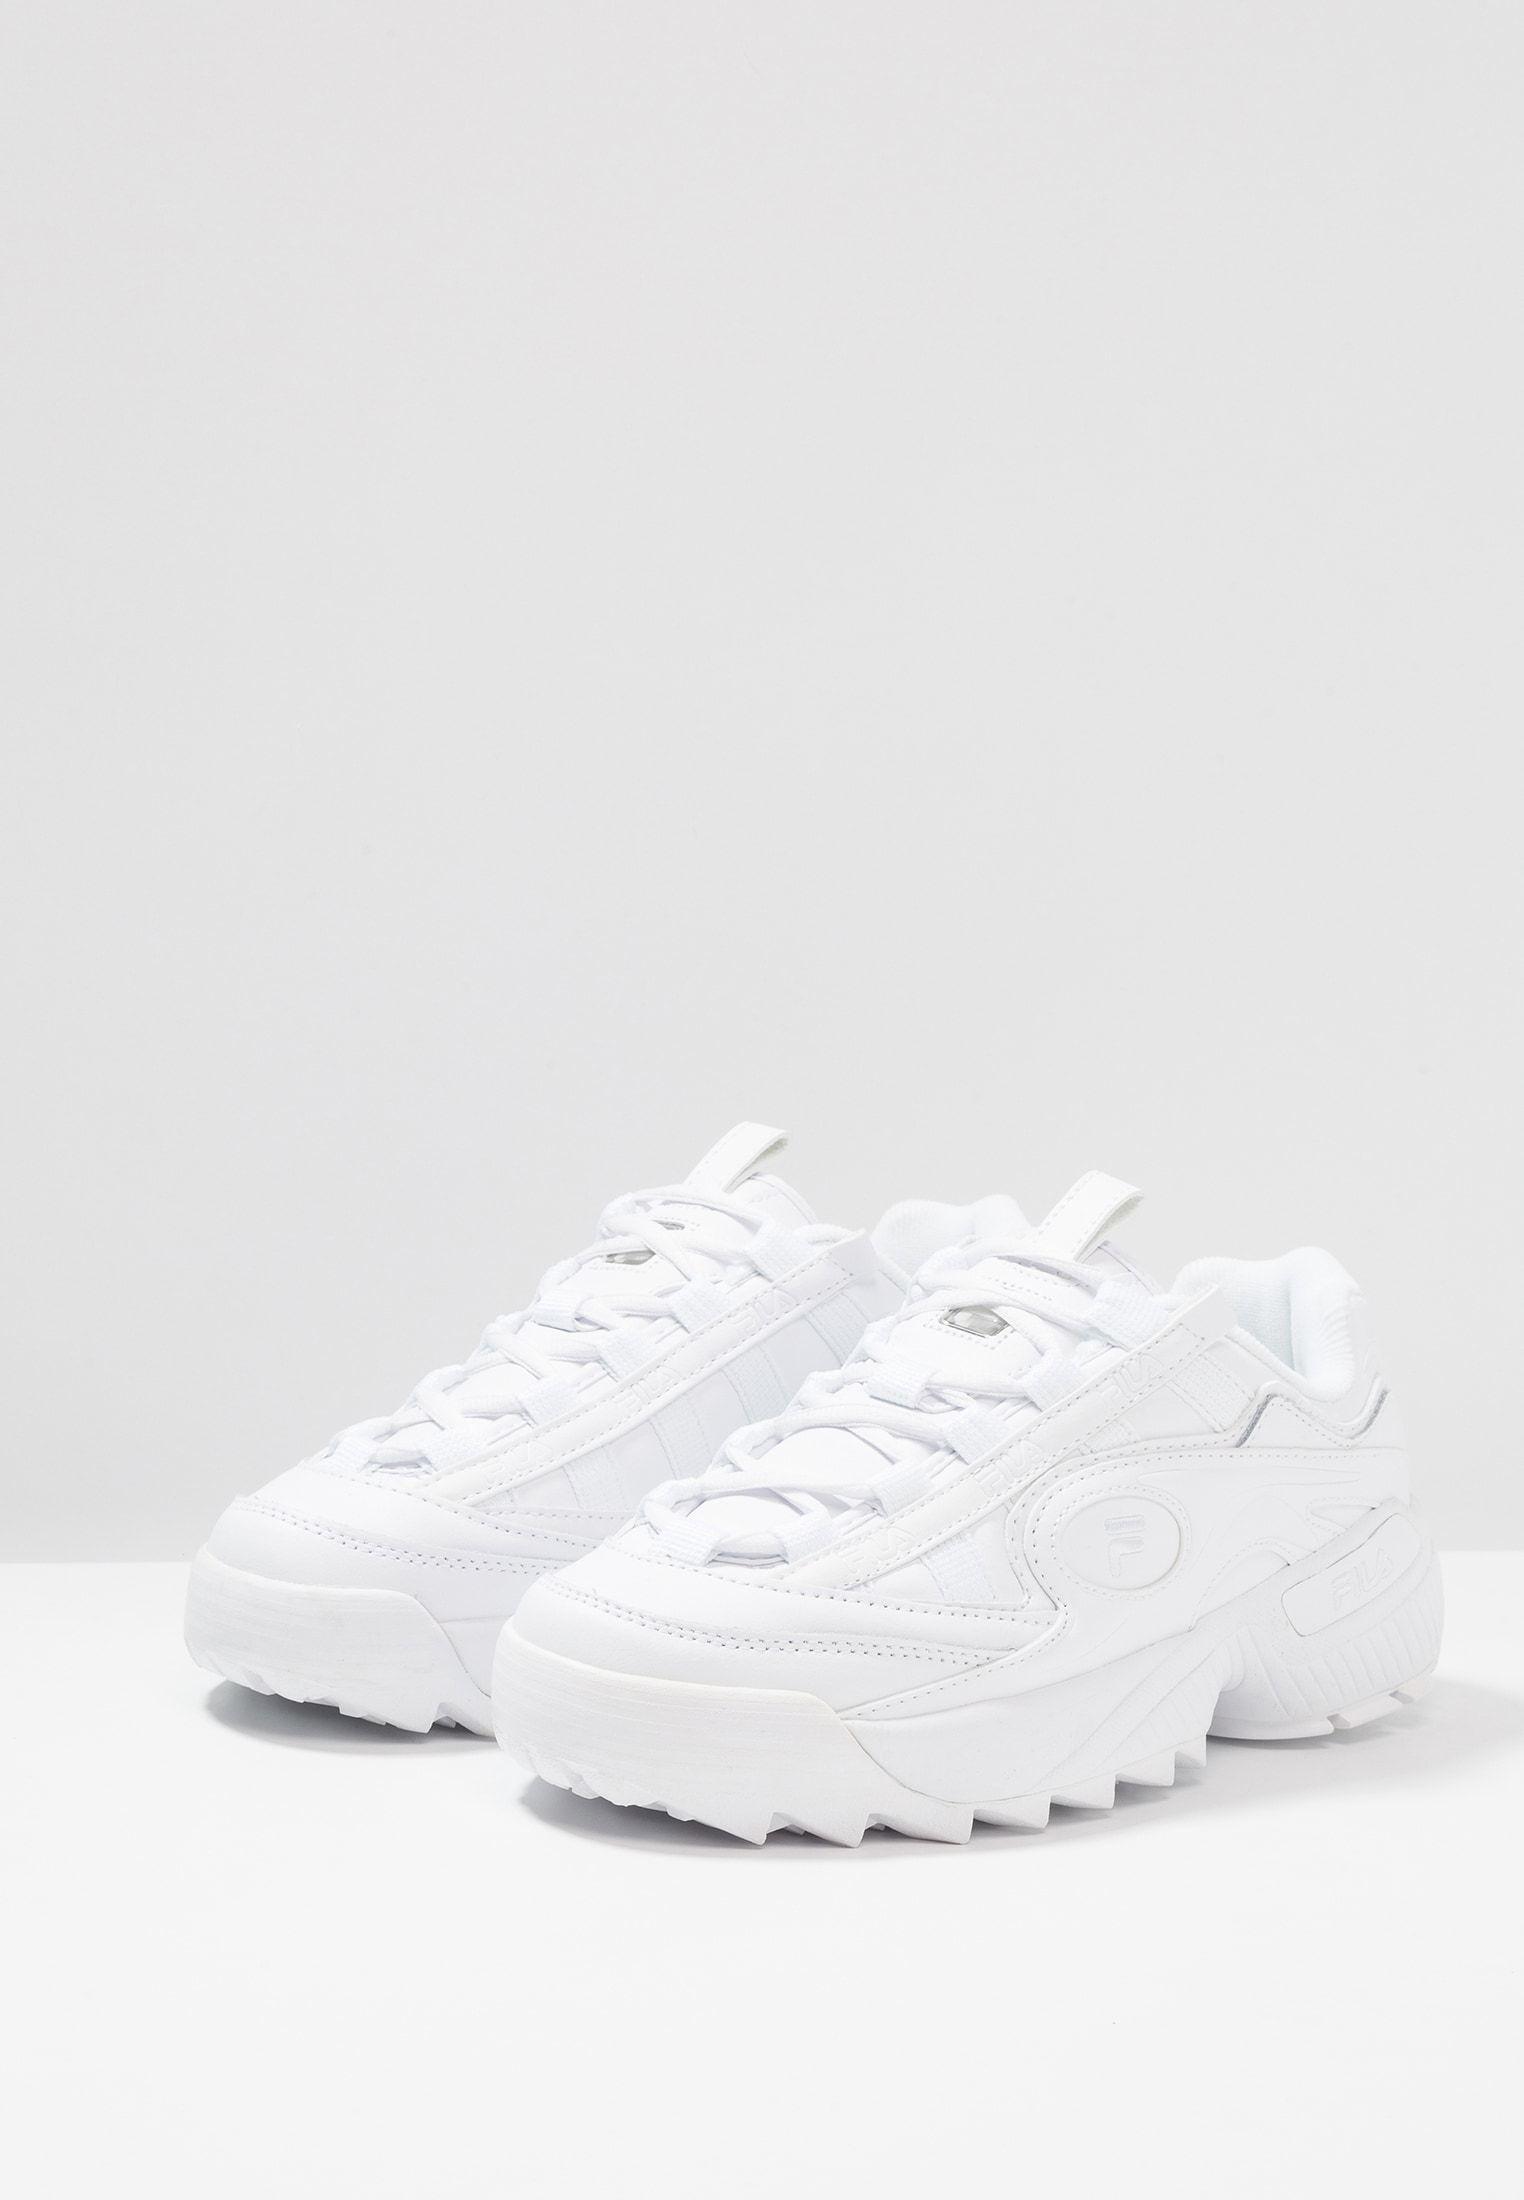 best sneakers dee7e a9da8 Fila D-FORMATION - Trainers - white - Zalando.co.uk